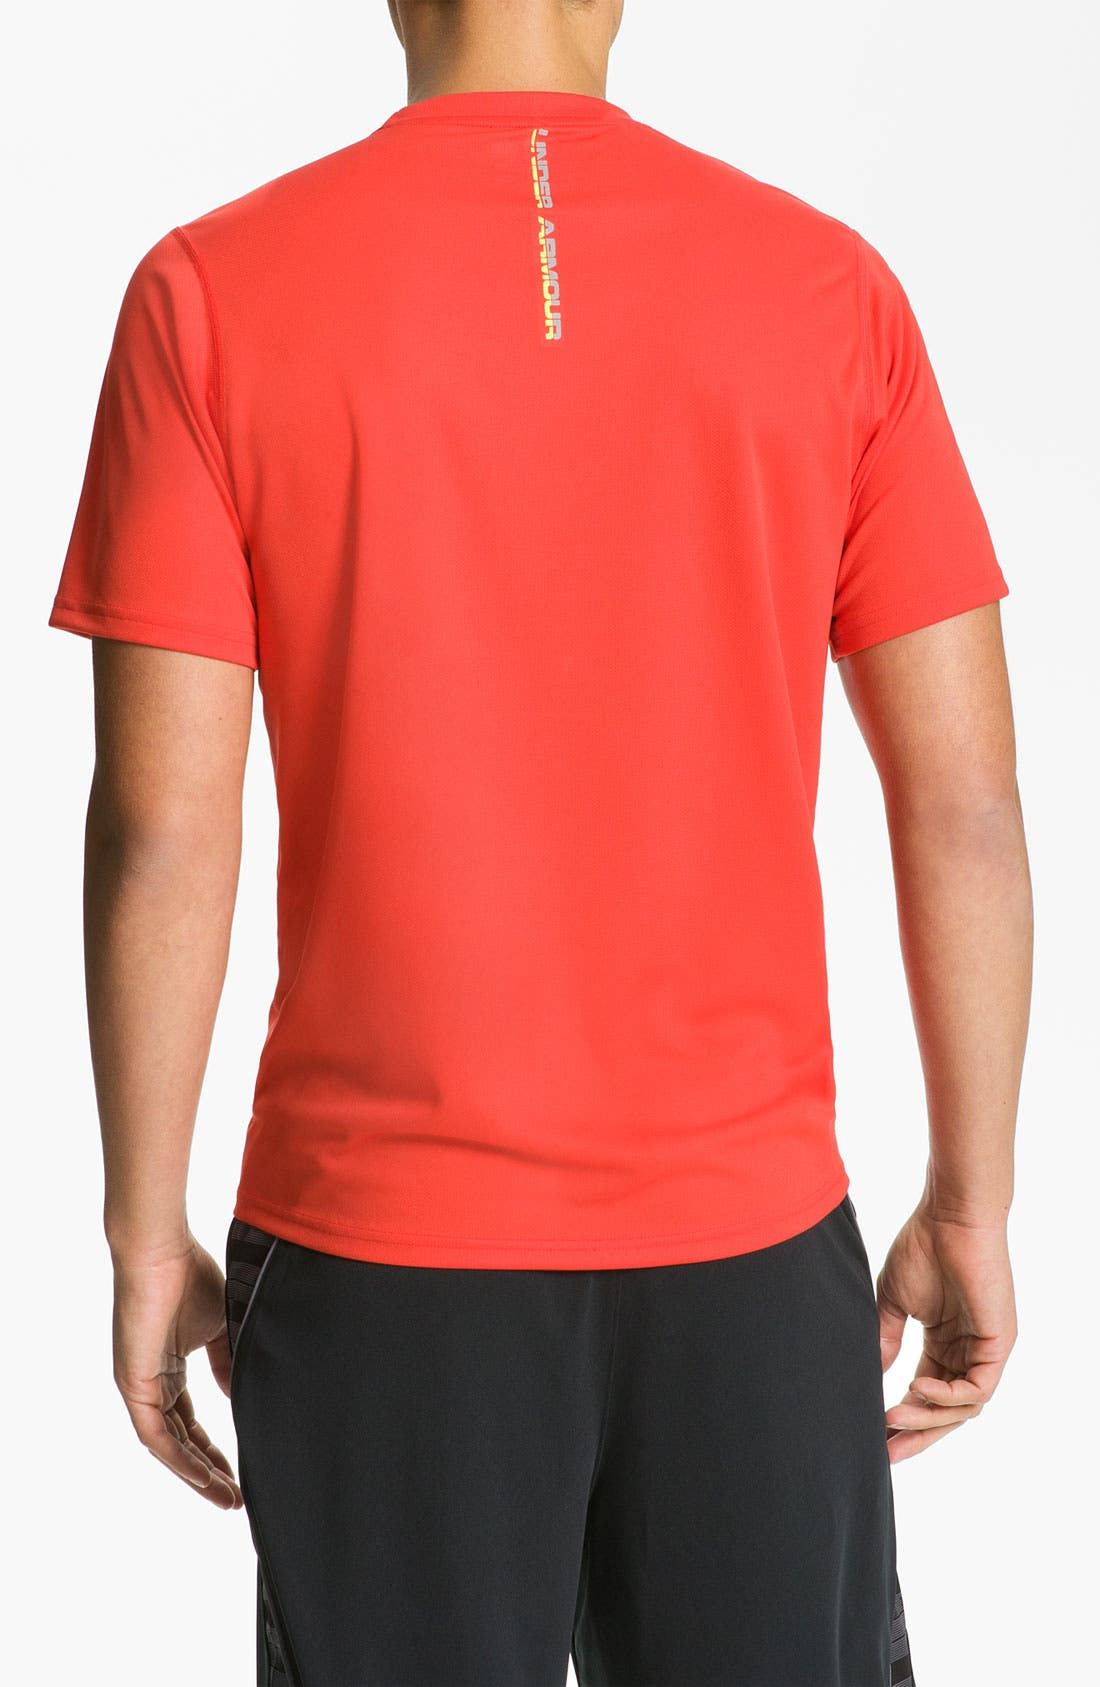 Alternate Image 2  - Under Armour 'Run' HeatGear® Short Sleeve T-Shirt